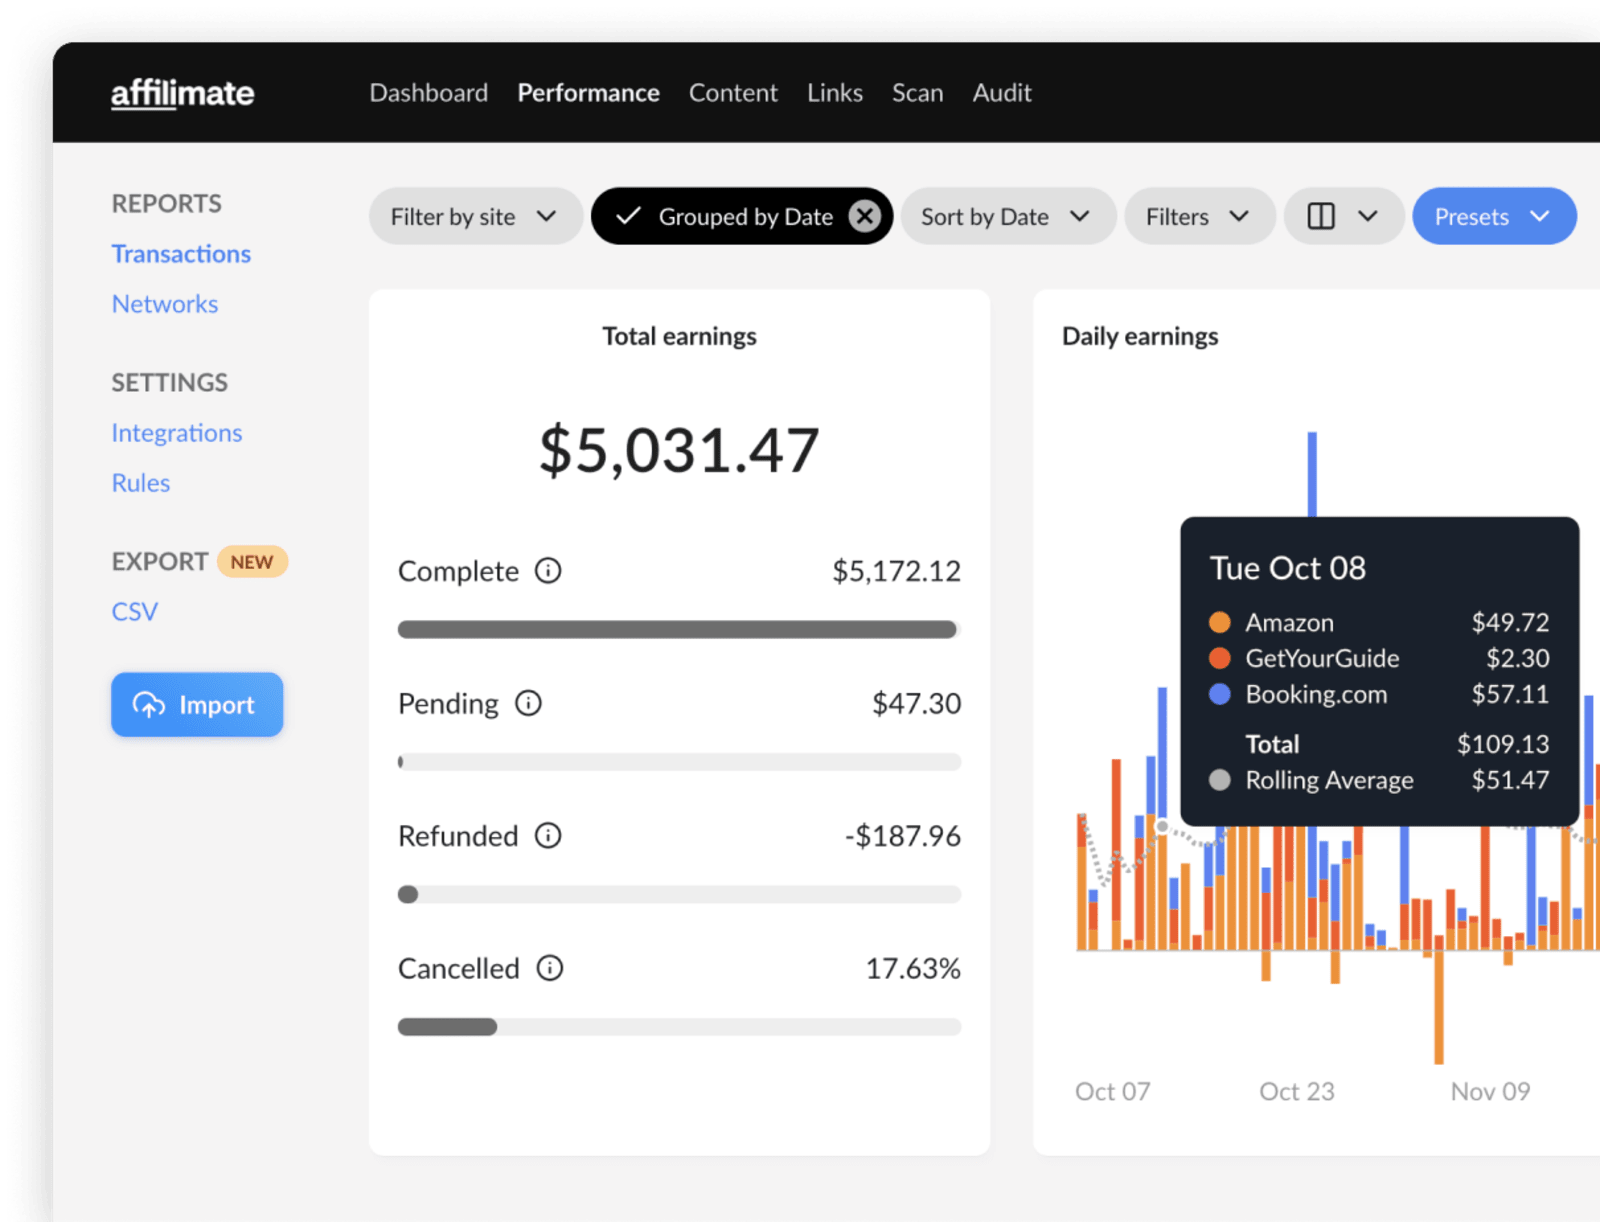 Affilimate Analytics App